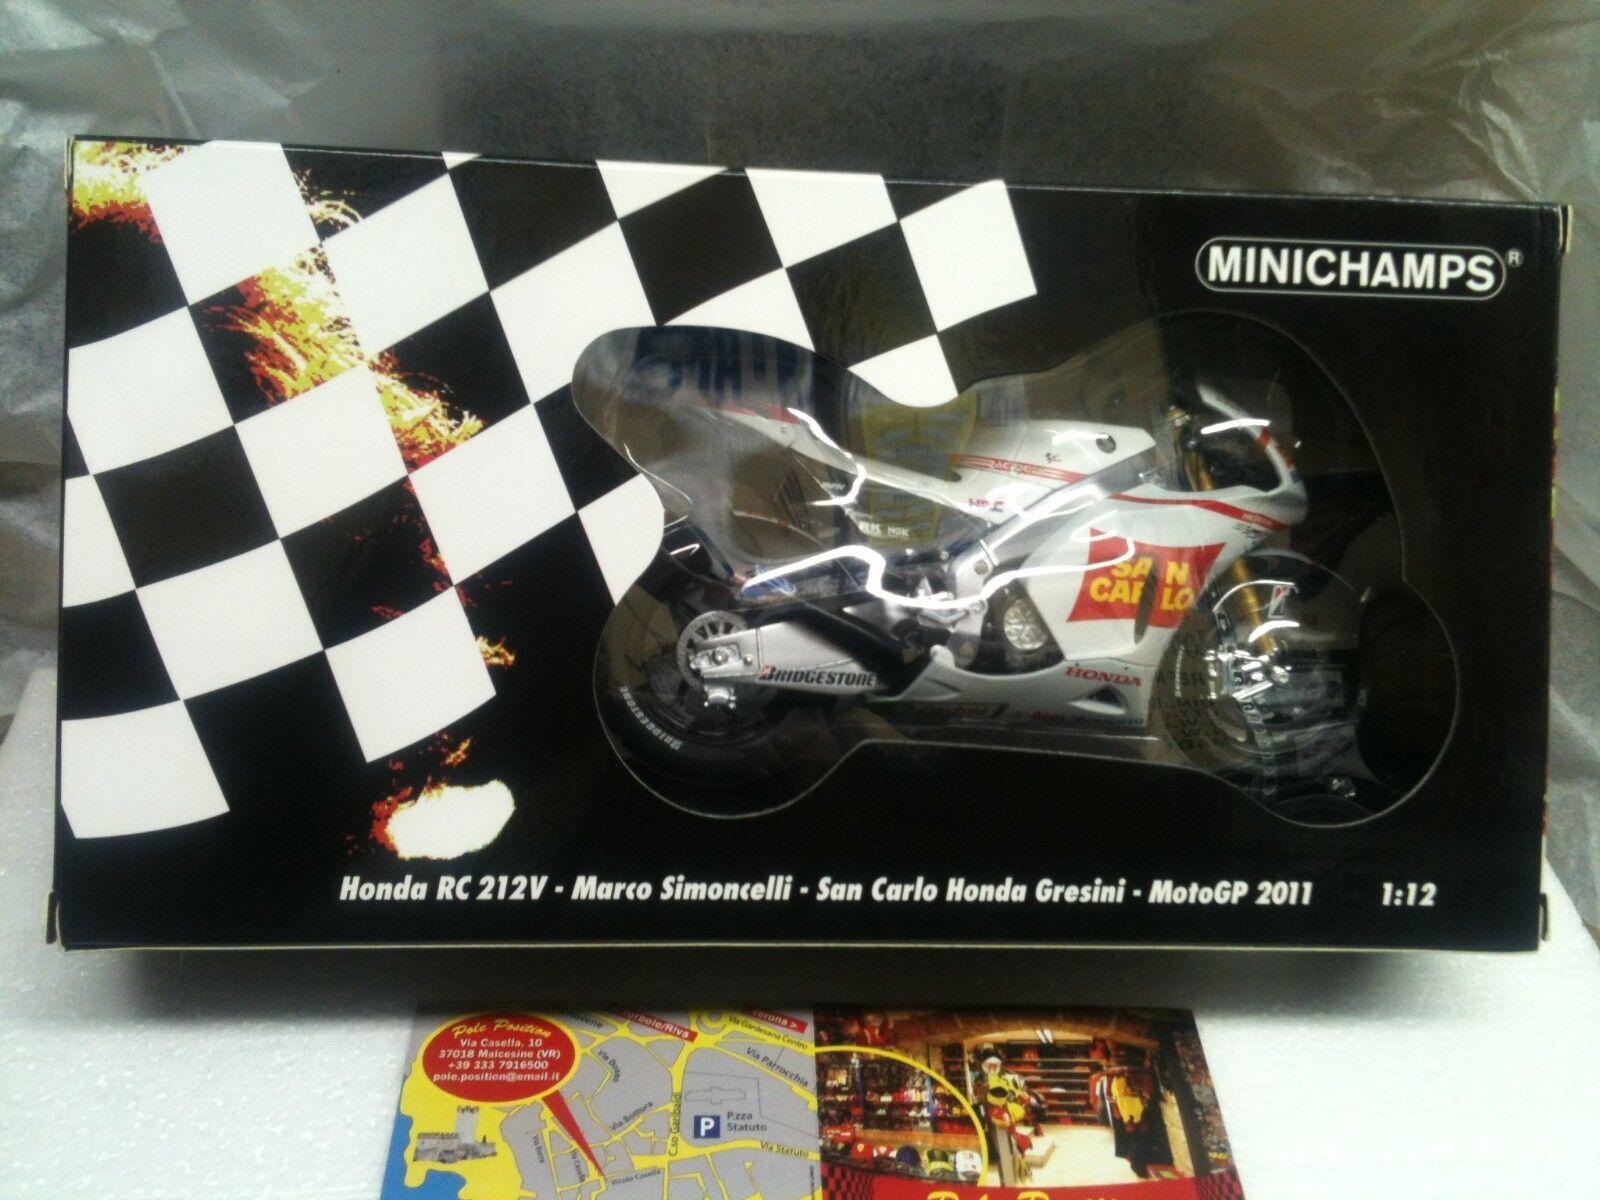 1 12 minichamps honda simoncelli Team gresini 2011 Free Shipping Worldwide NEW